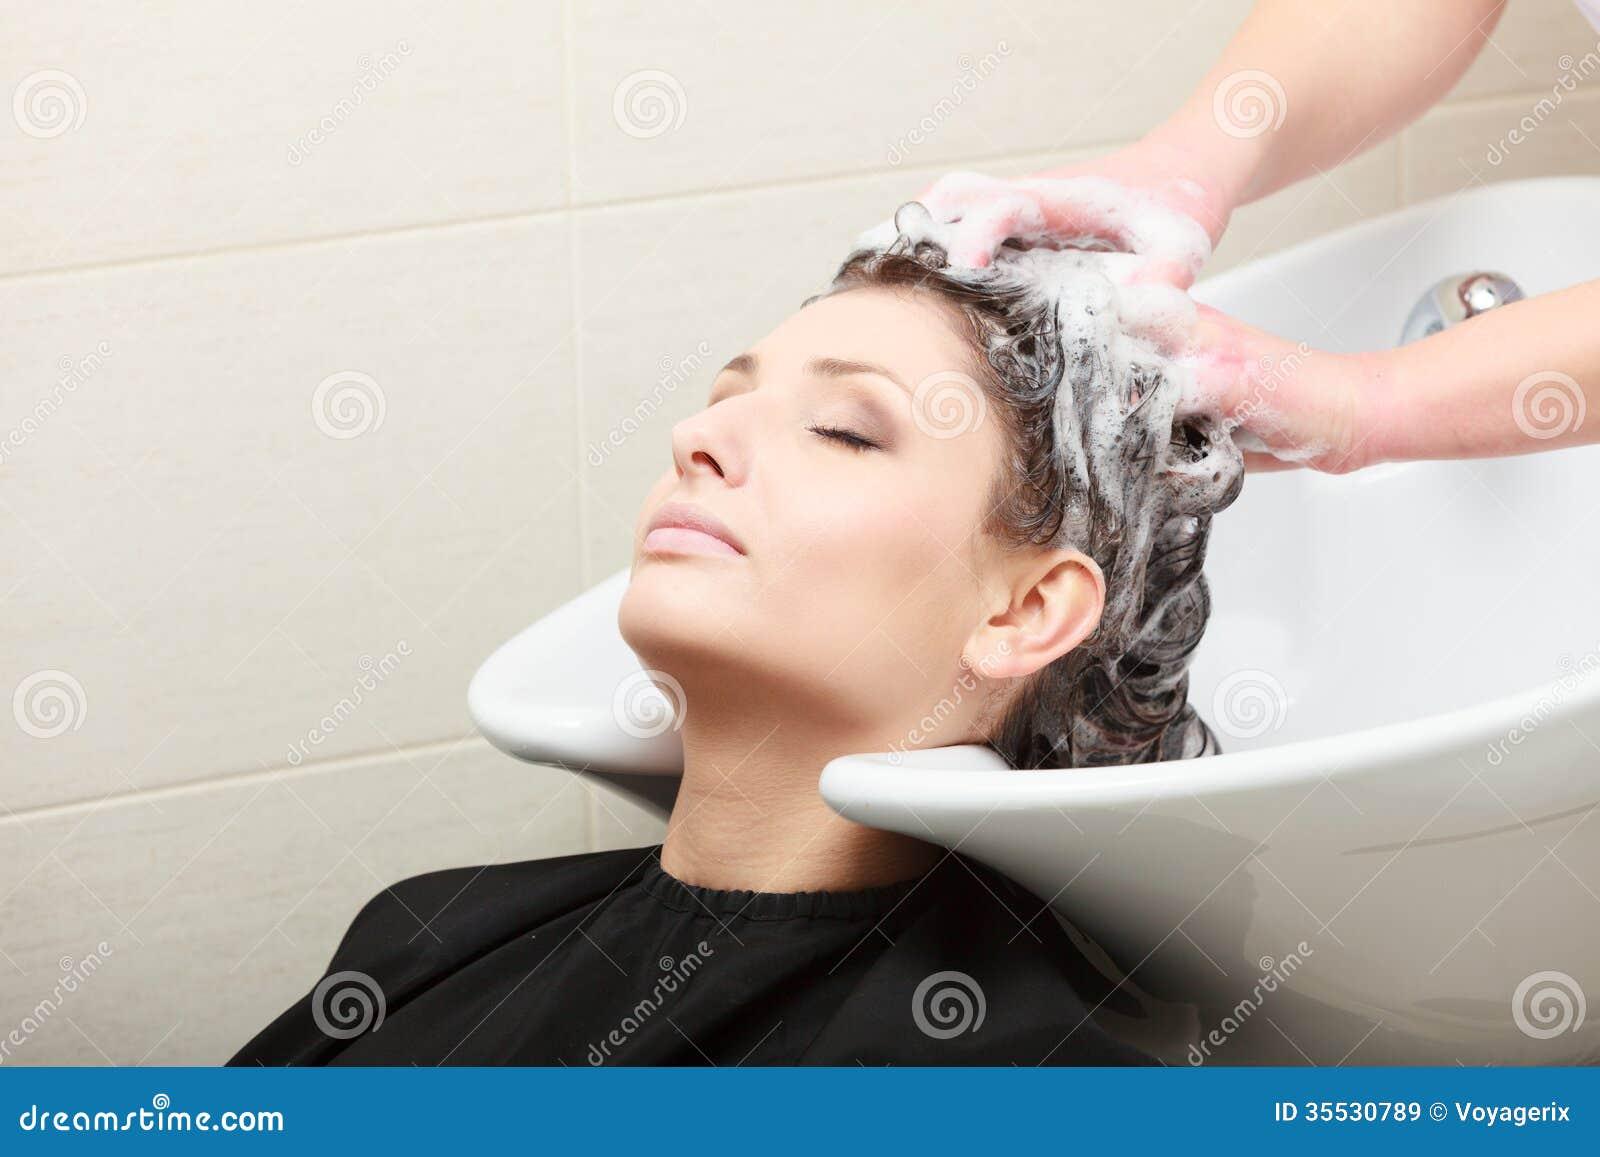 Hair washing at a hairdressing salon royalty free stock for Wash hair salon